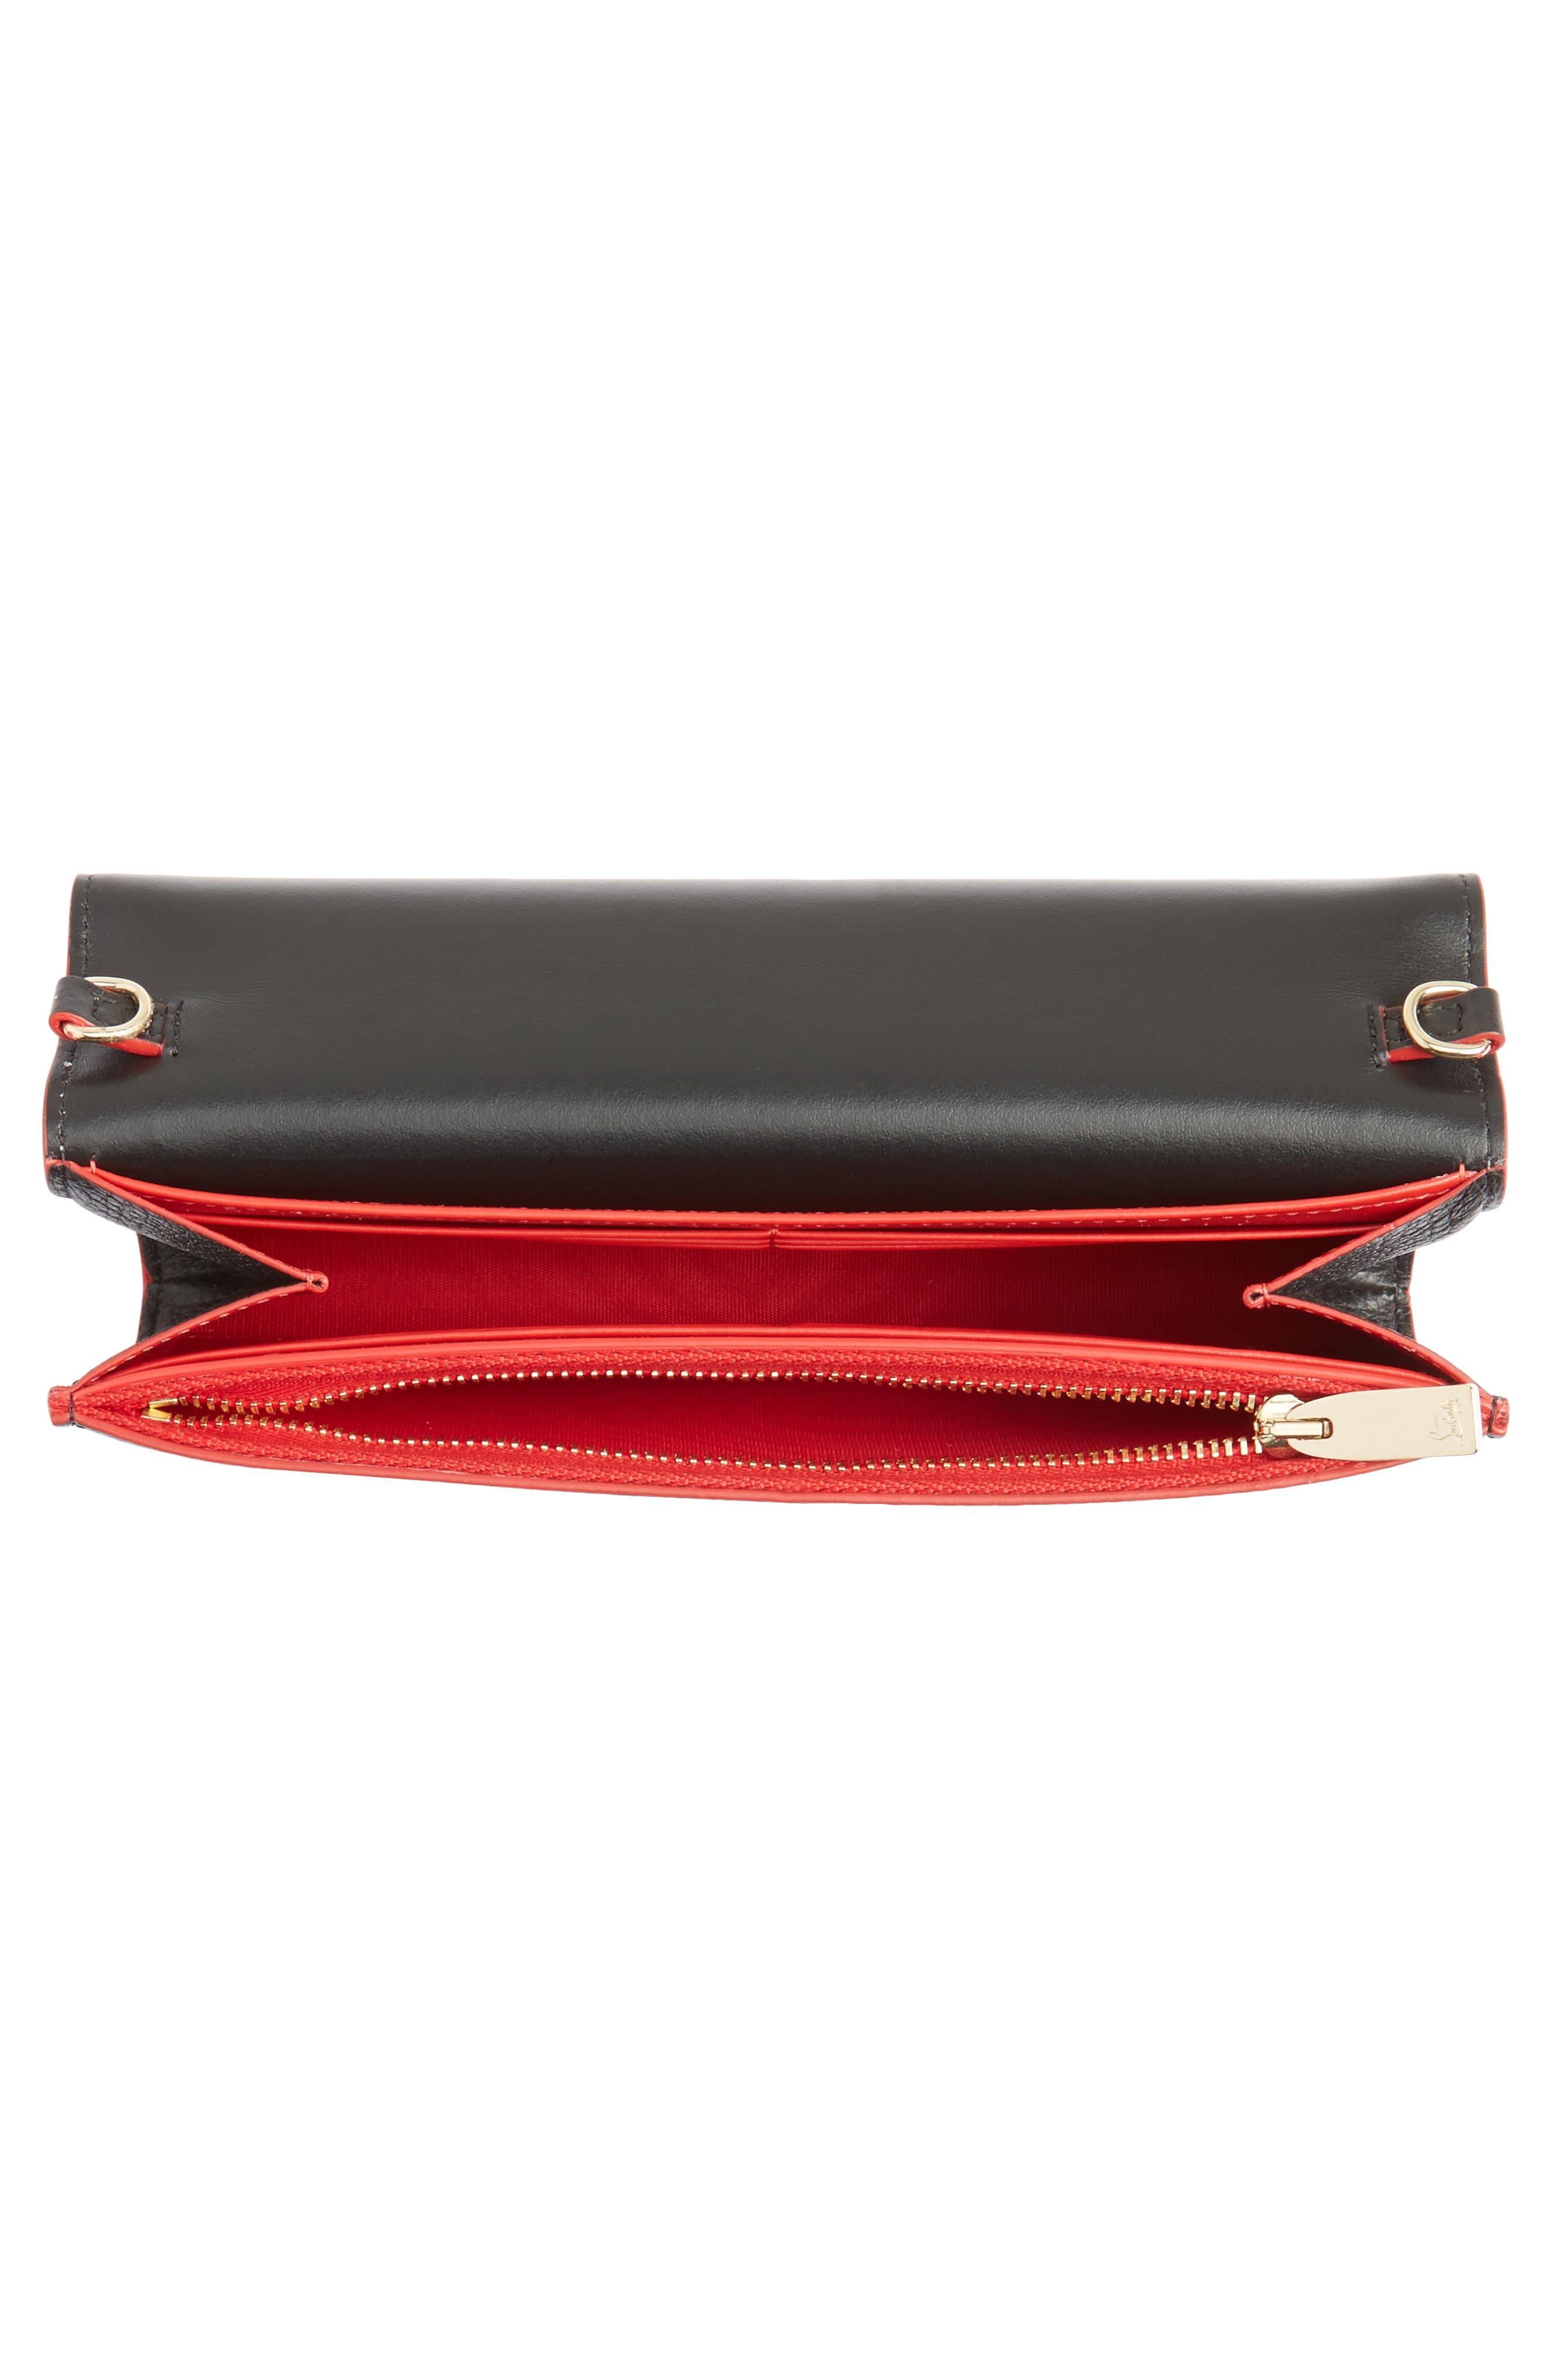 Boudoir Calfskin Leather Wallet,                             Alternate thumbnail 4, color,                             BLACK/ GOLD